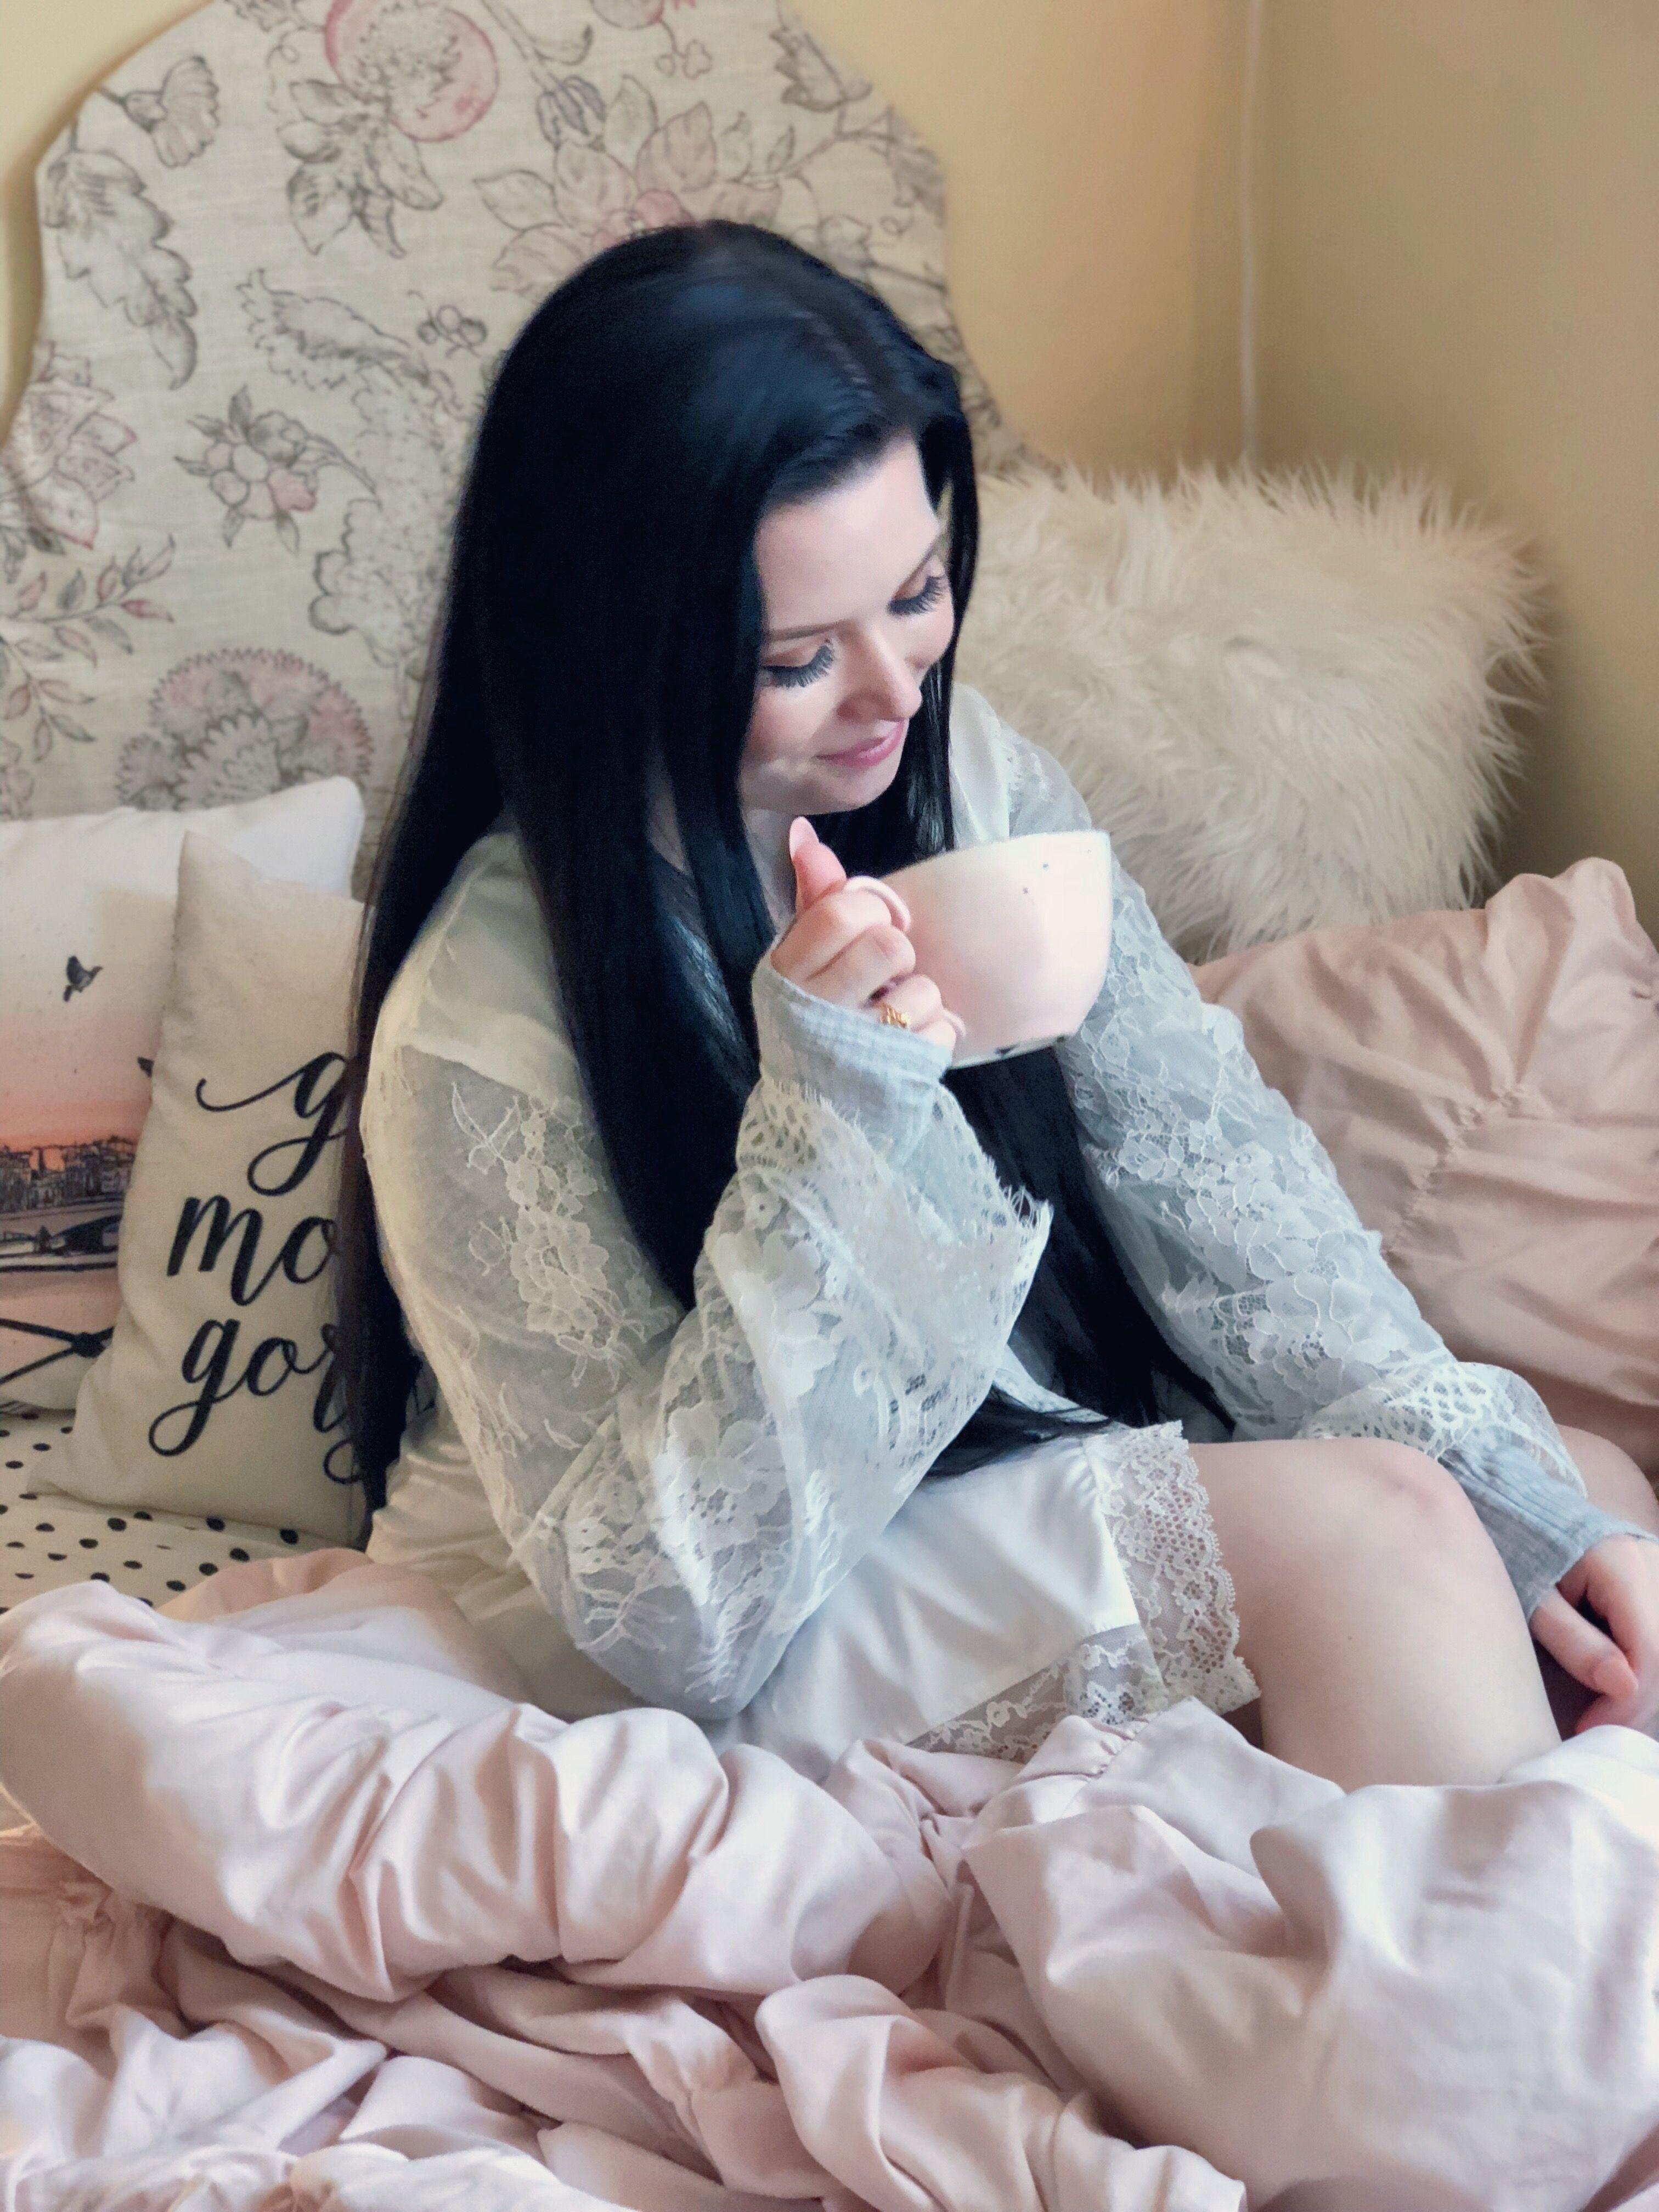 8555b7c11176 Meet the girl behind the blog!  blog  blogger  pose  posing  candid  cozy   bed  tea  coffee  pjs  pajamas  pillows  blankets  lifestyleblogger ...